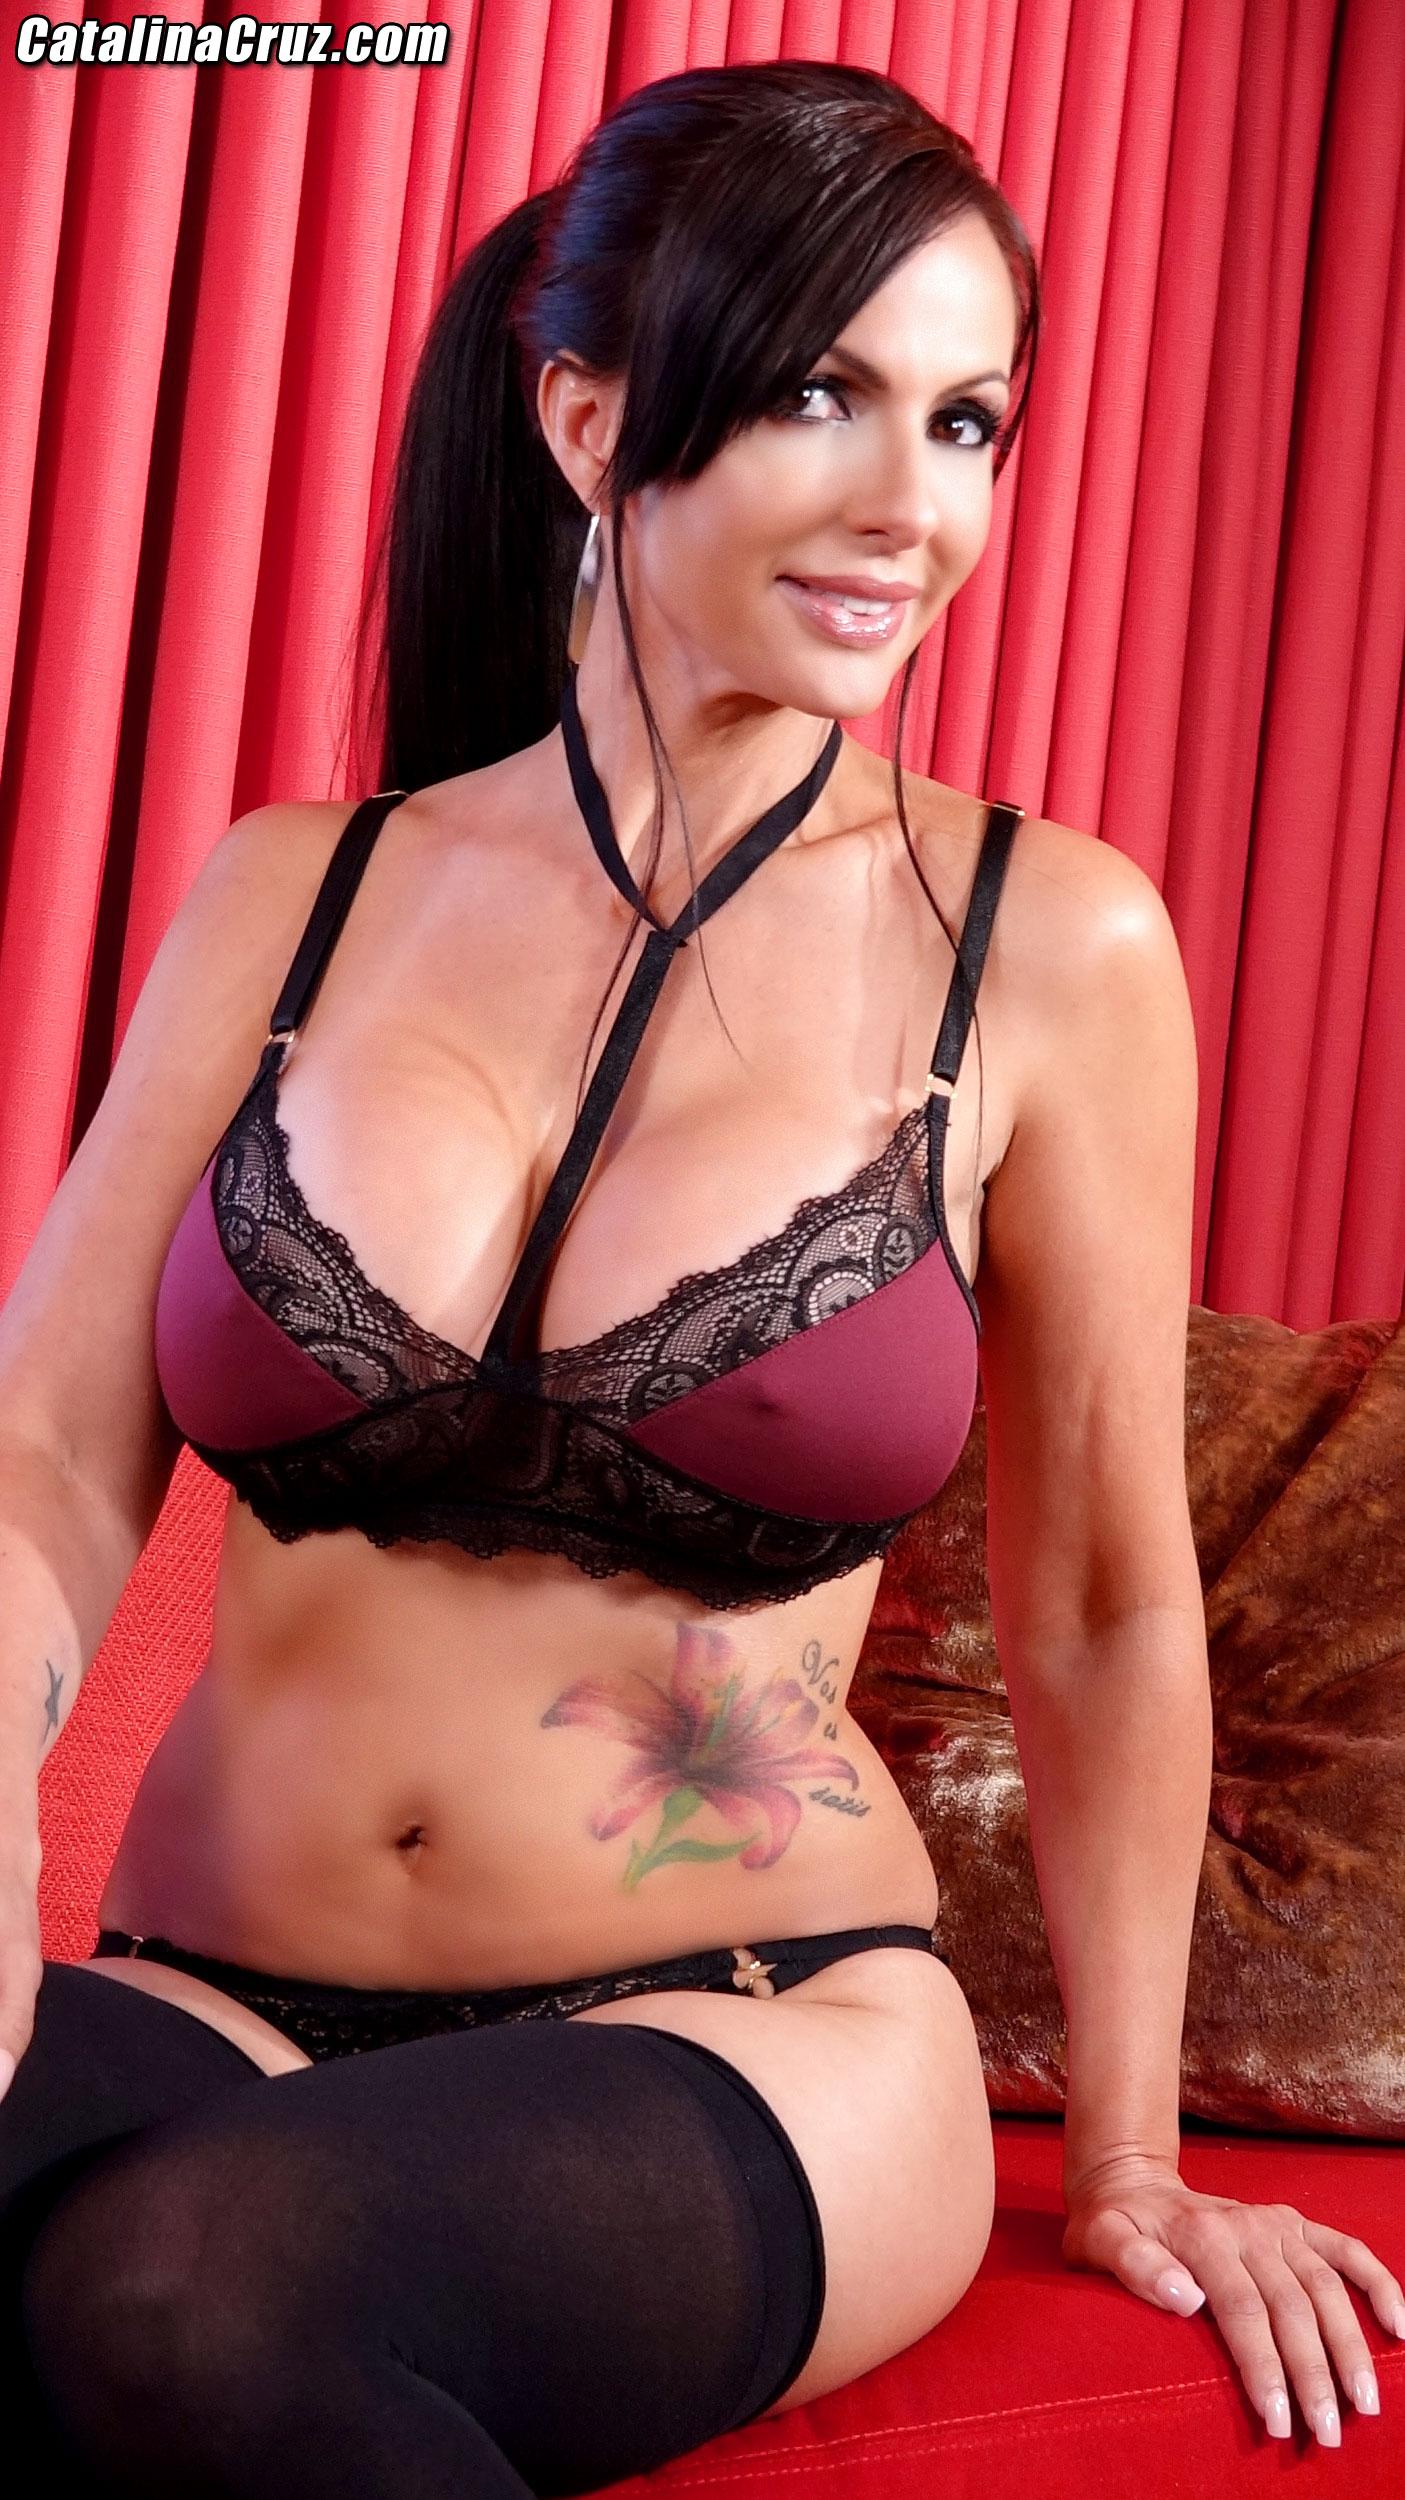 Catalina Cruz Big Tits Maroon Bra and stockings